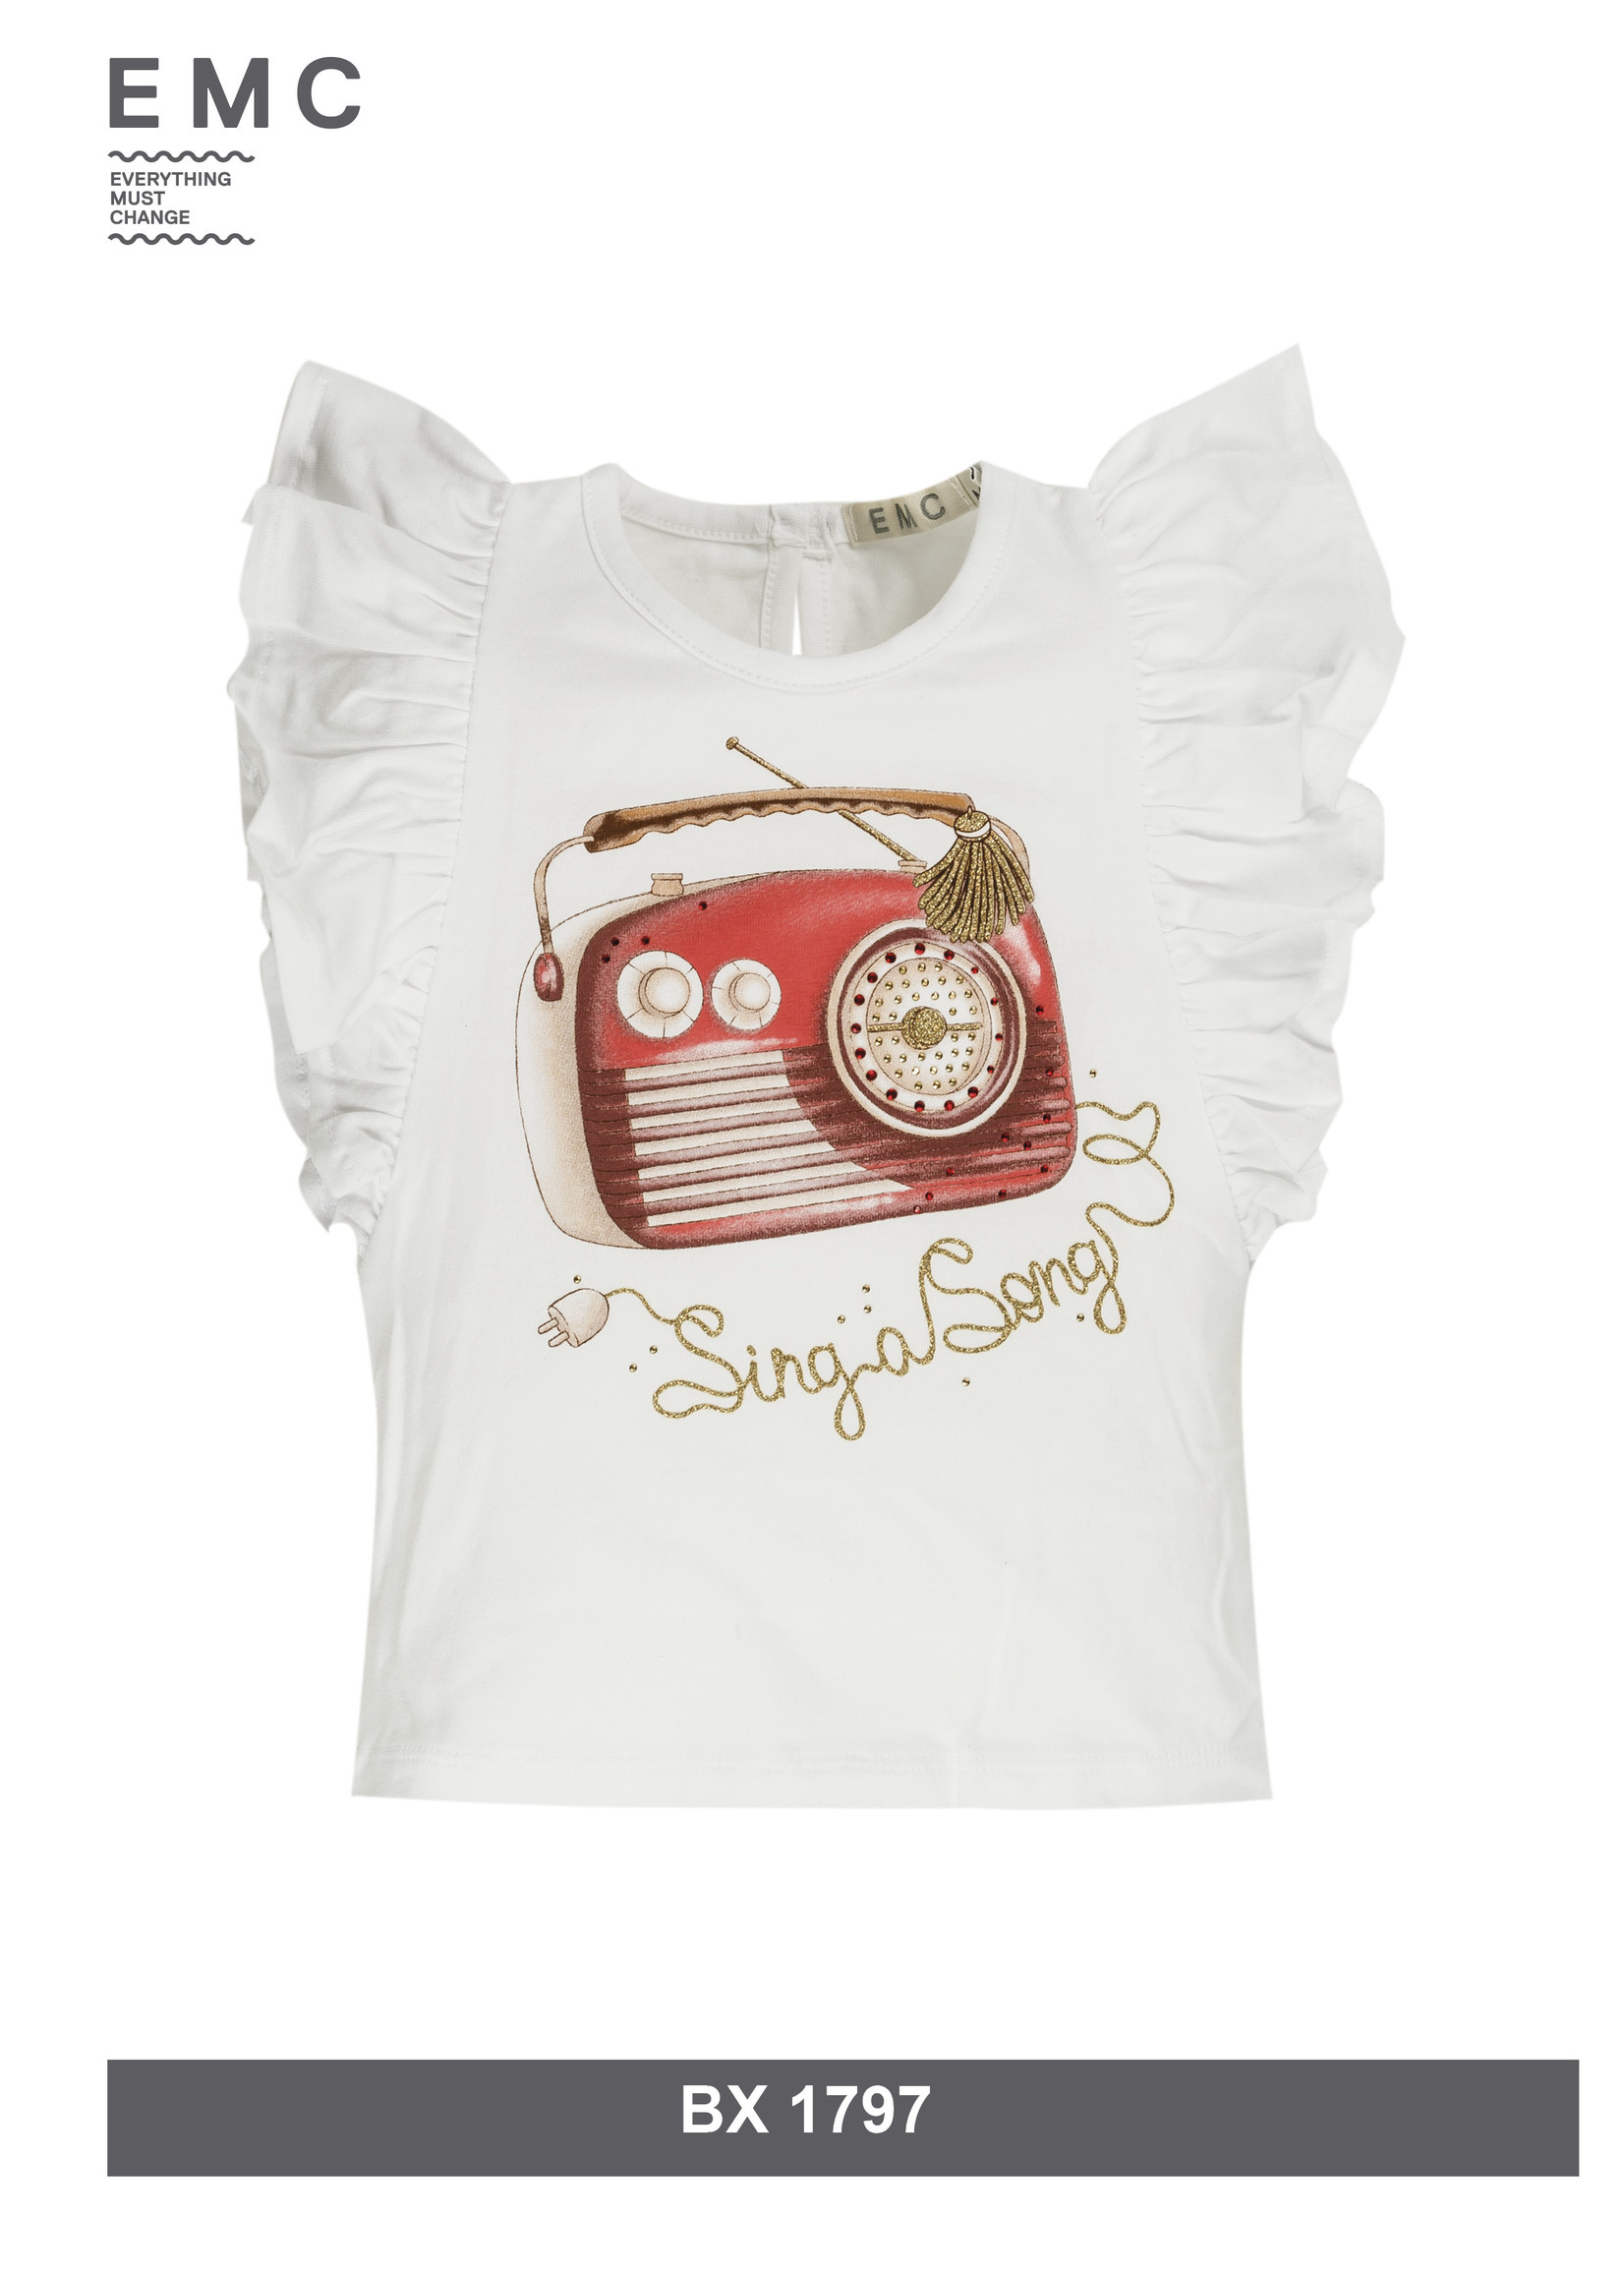 EMC EMC sing a song shirt